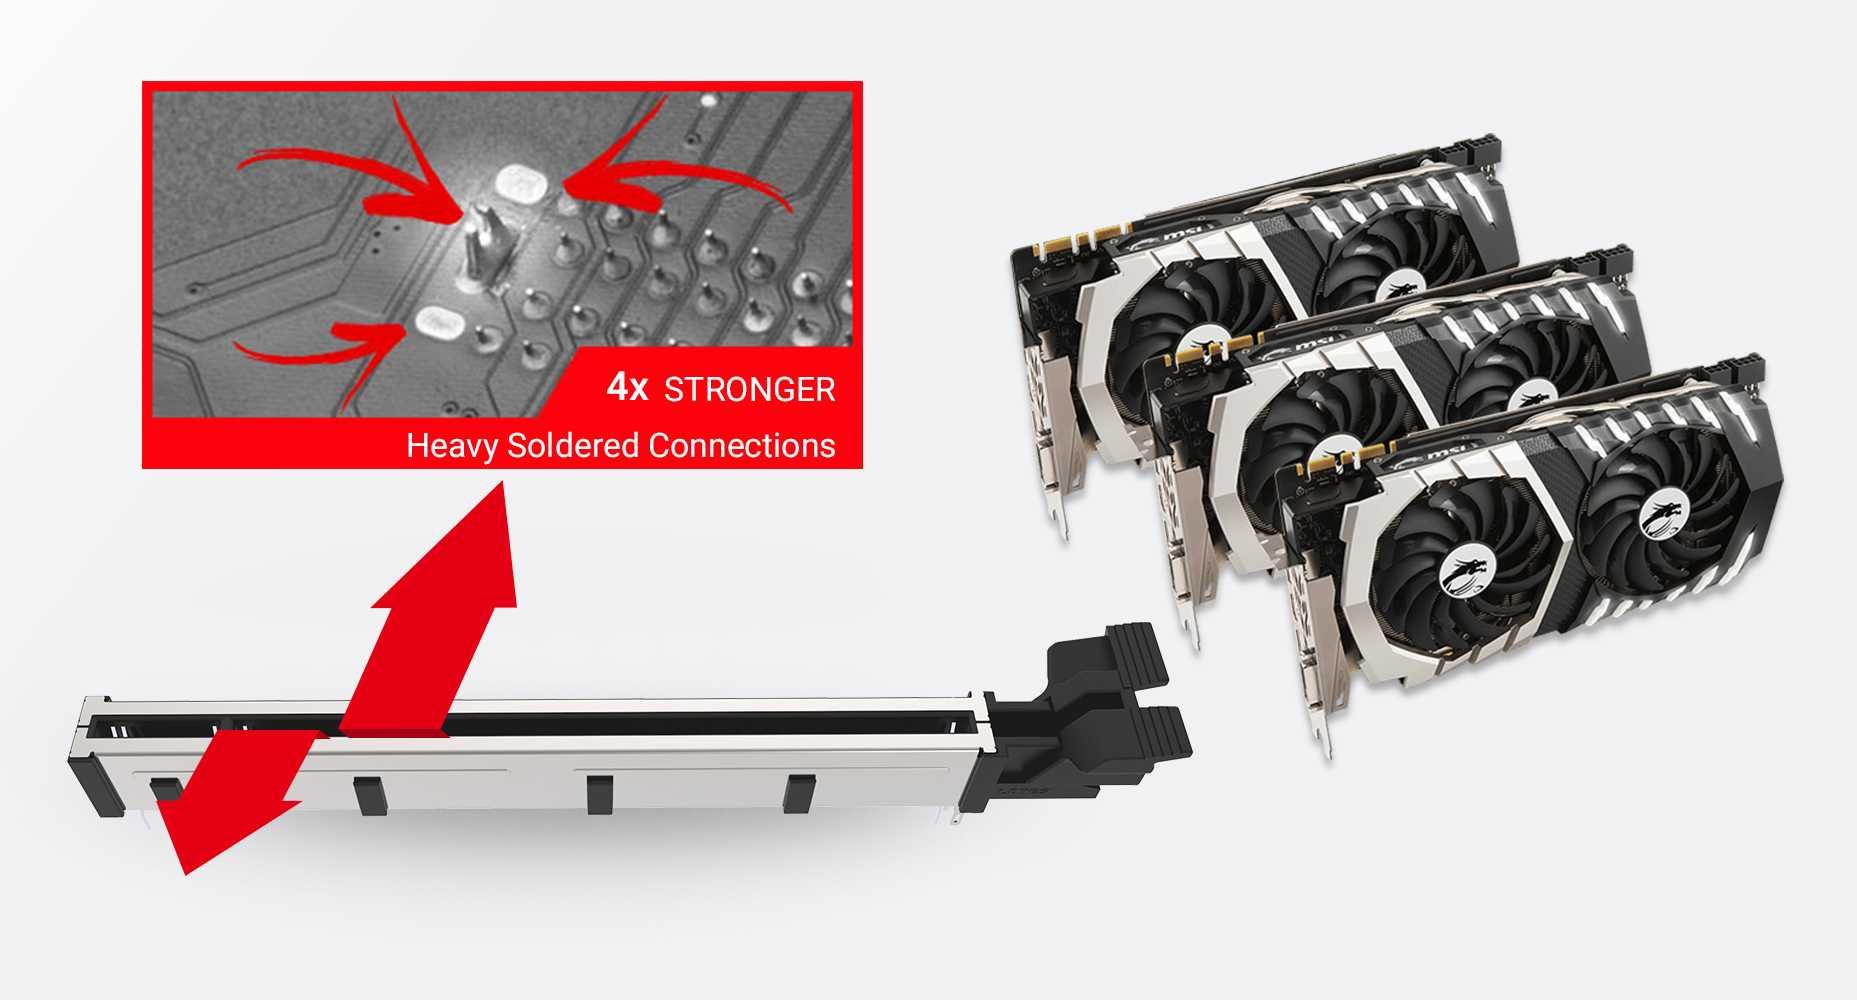 MSI MPG Z490 CARBON EK X MULTIPLE GPU SUPPORTS AND STEEL ARMOR